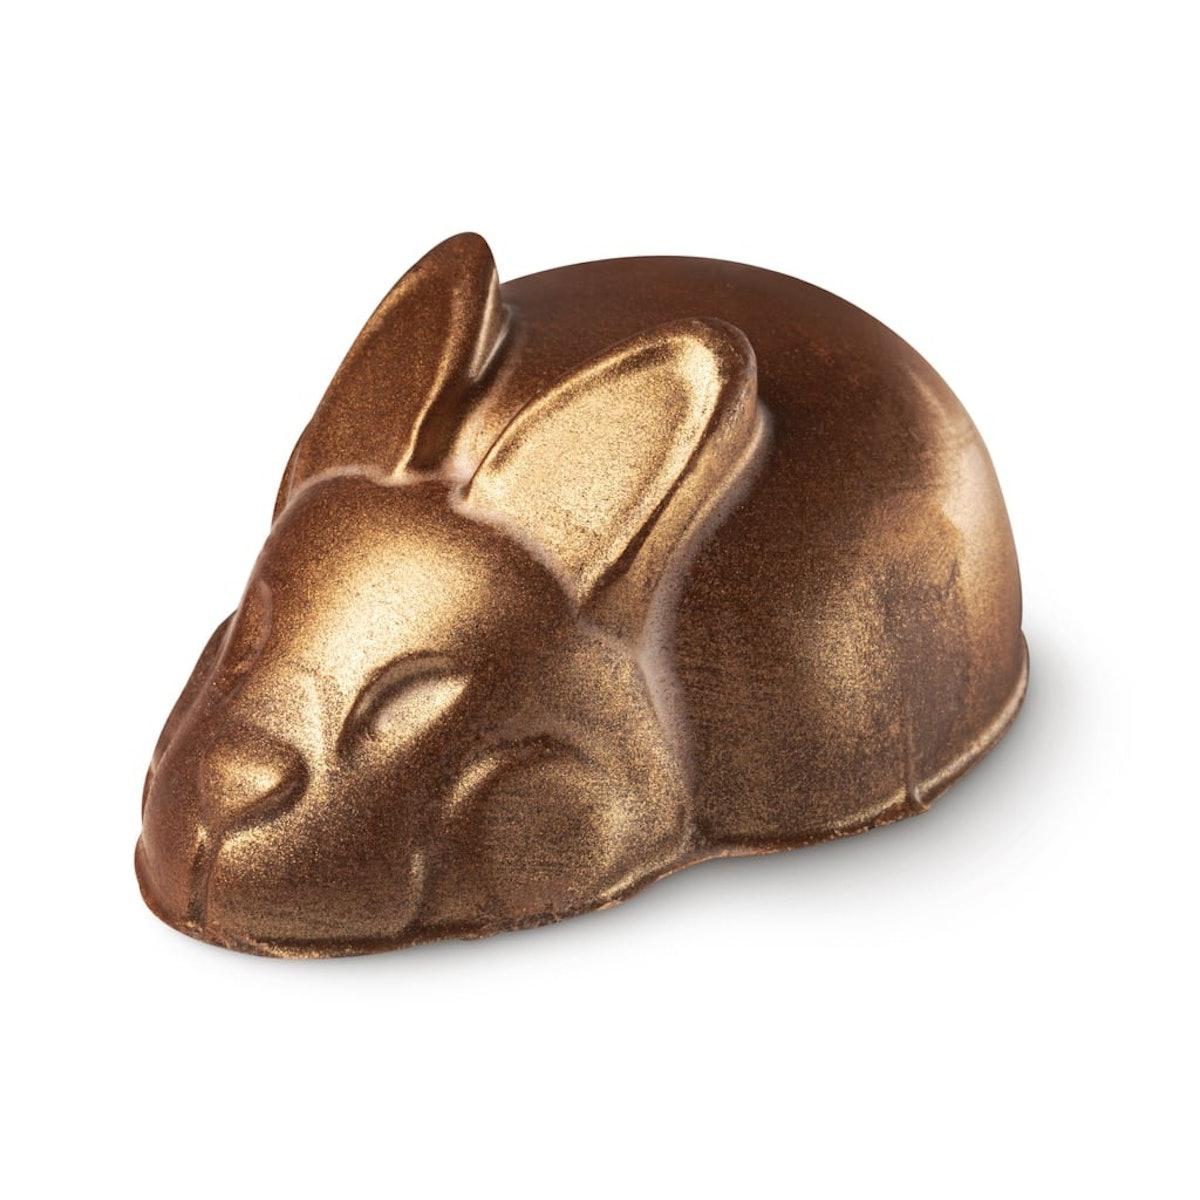 Walter Bunny Body Butter